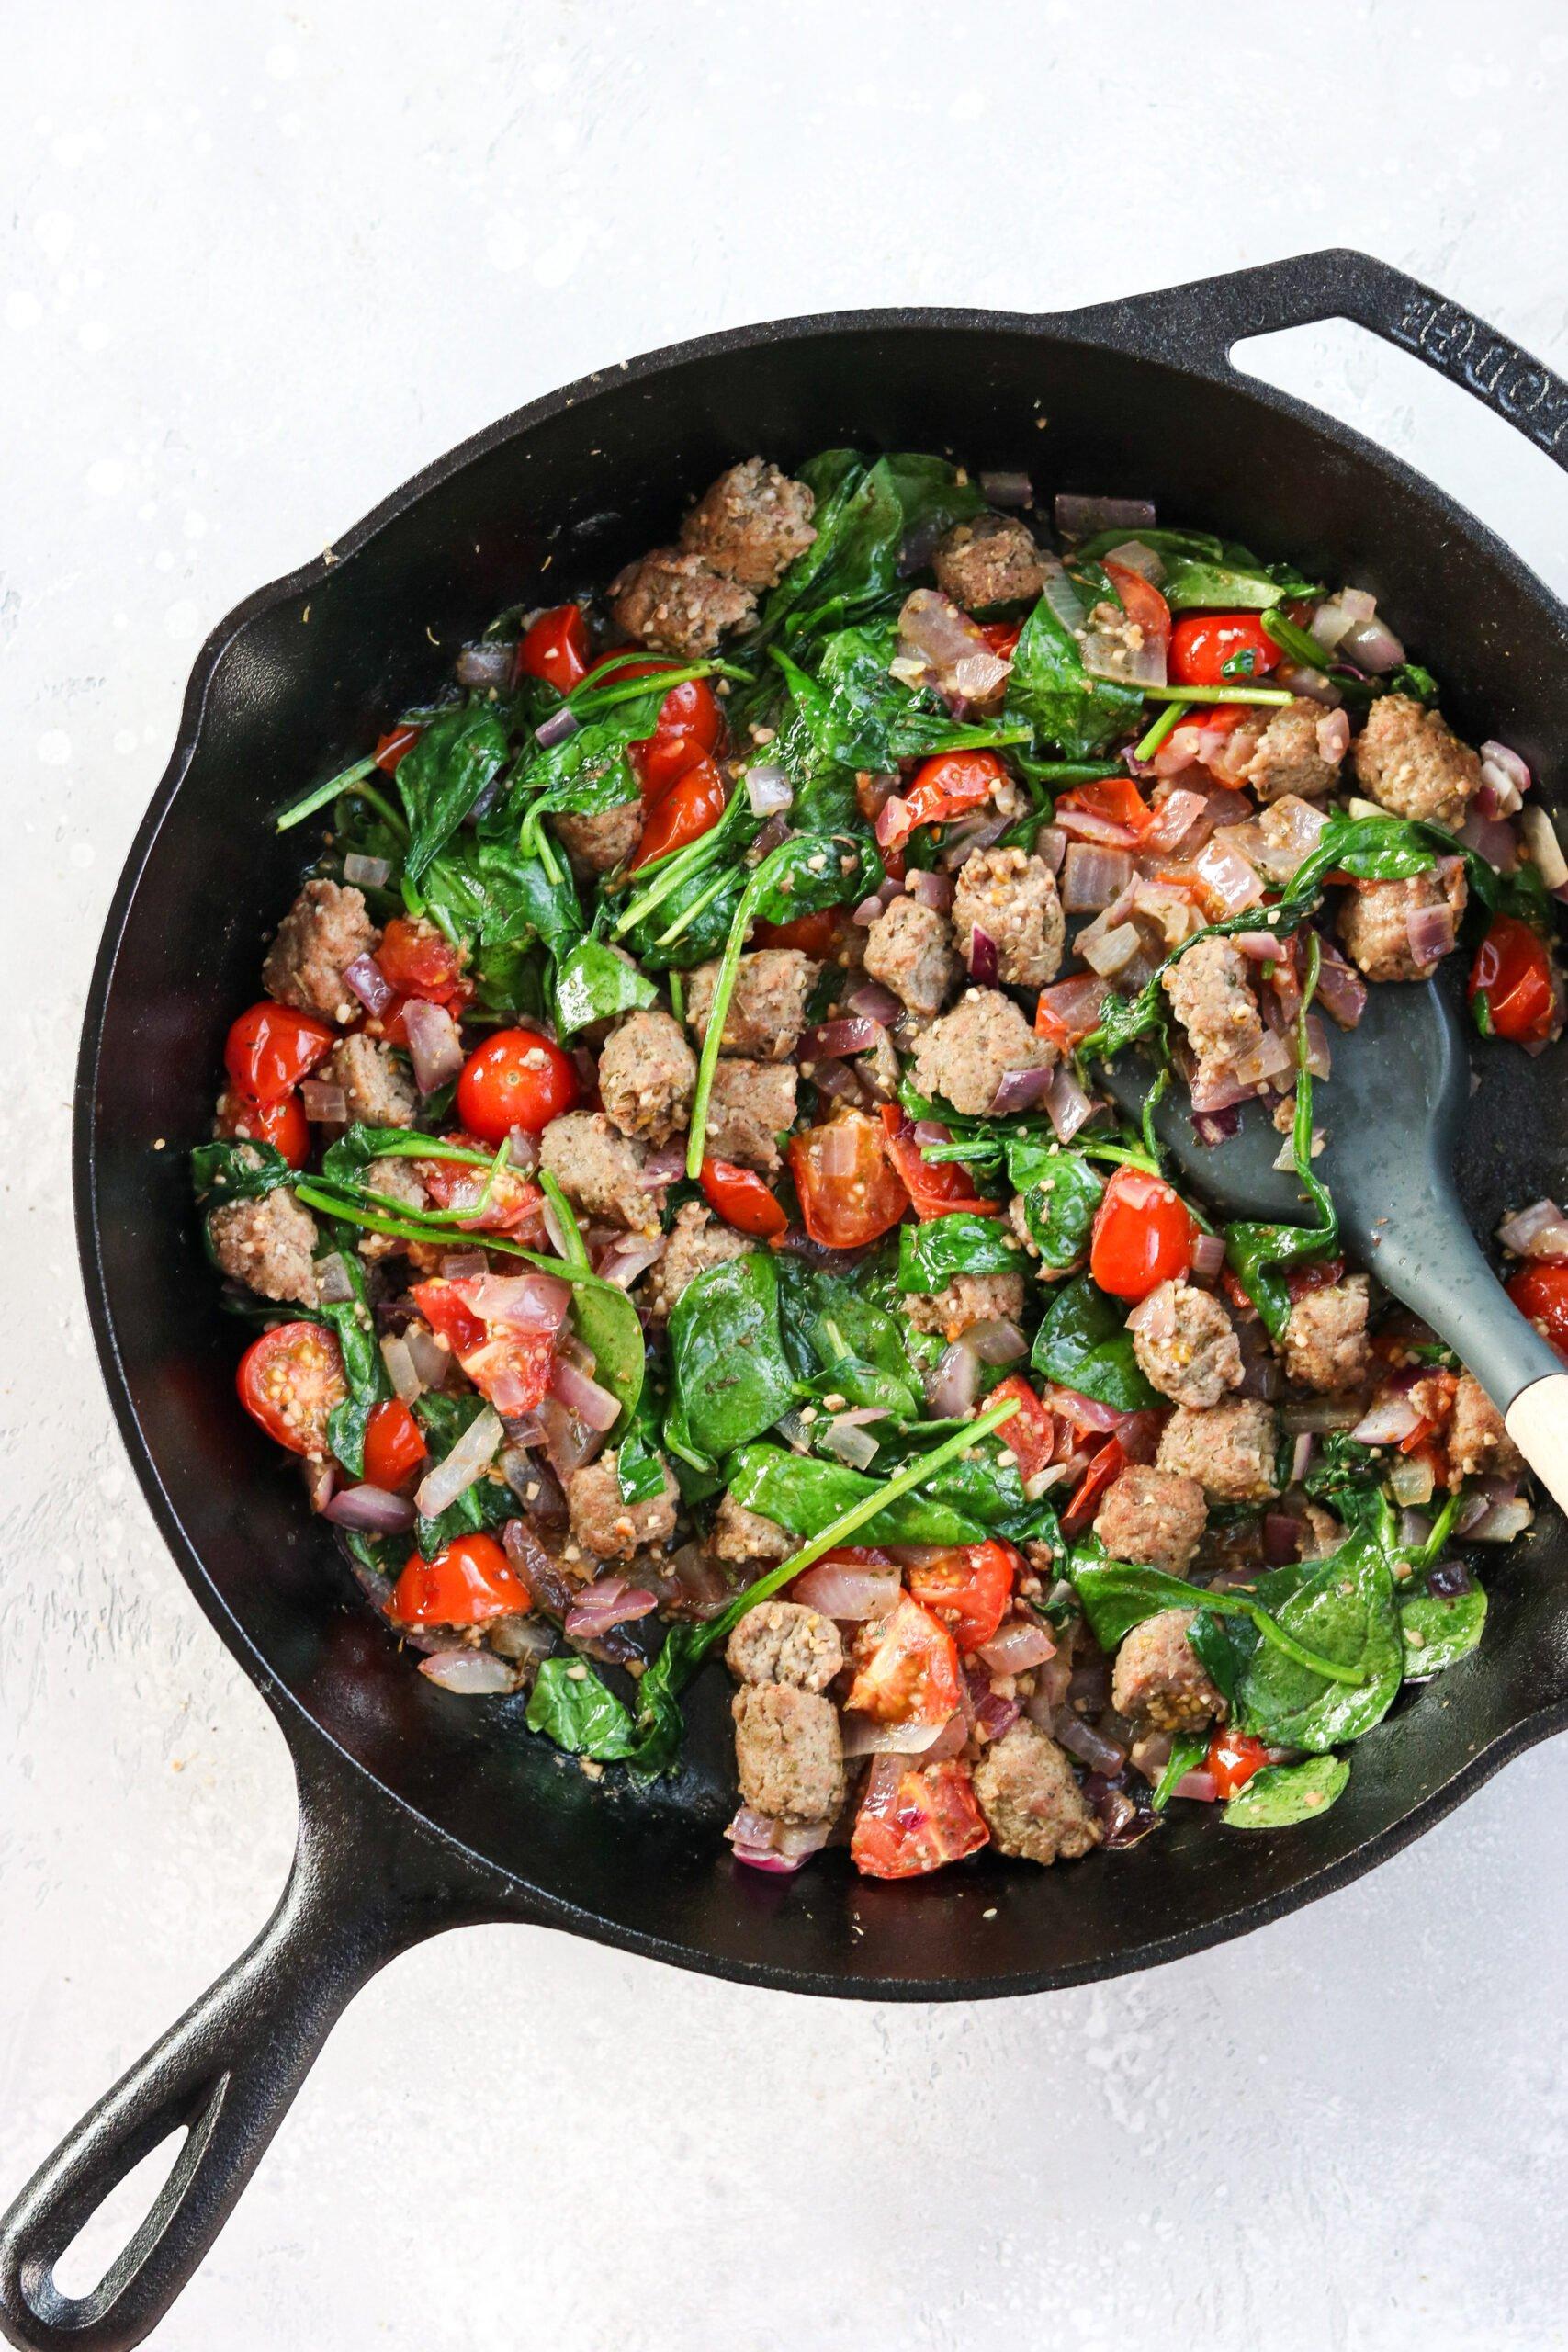 Sauteed turkey sausage, tomato, and spinach